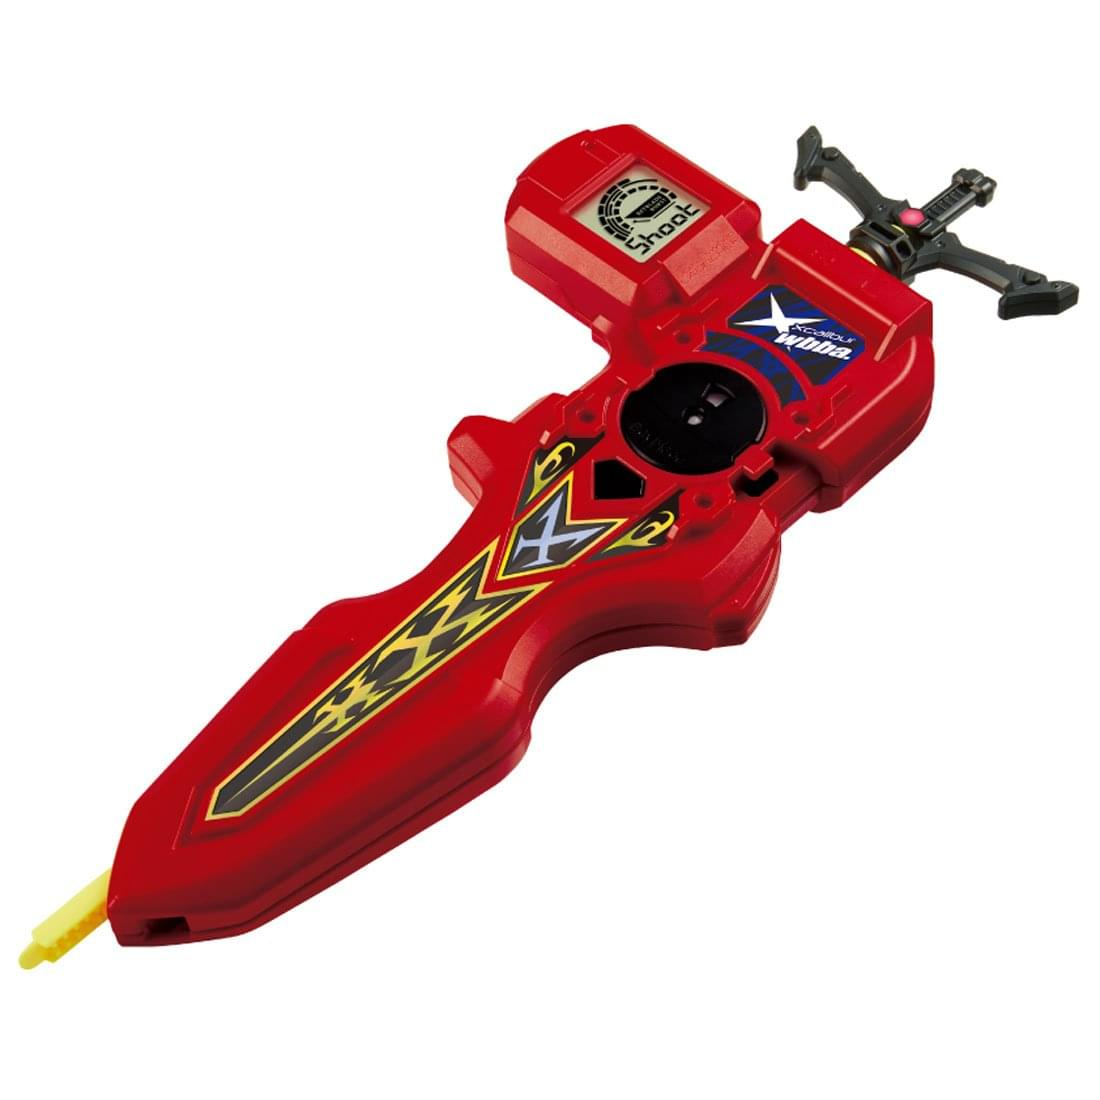 Beyblade Burst Takaratomy B-94 Digital Sword Launcher Red